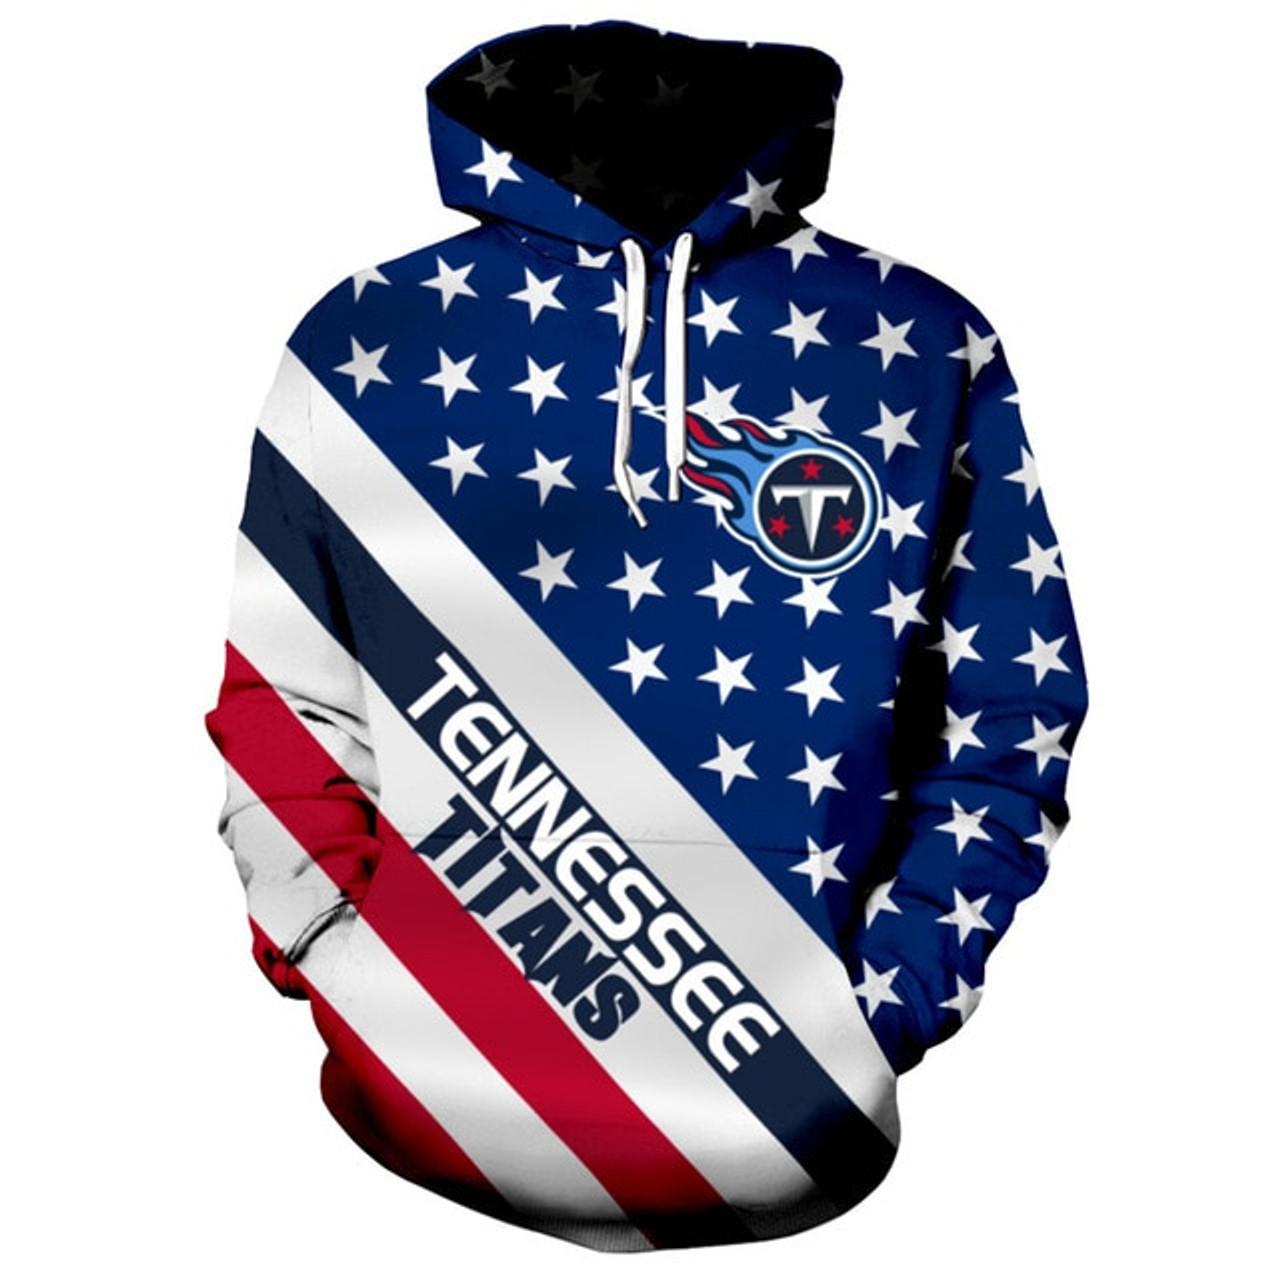 new york titans sweatshirt